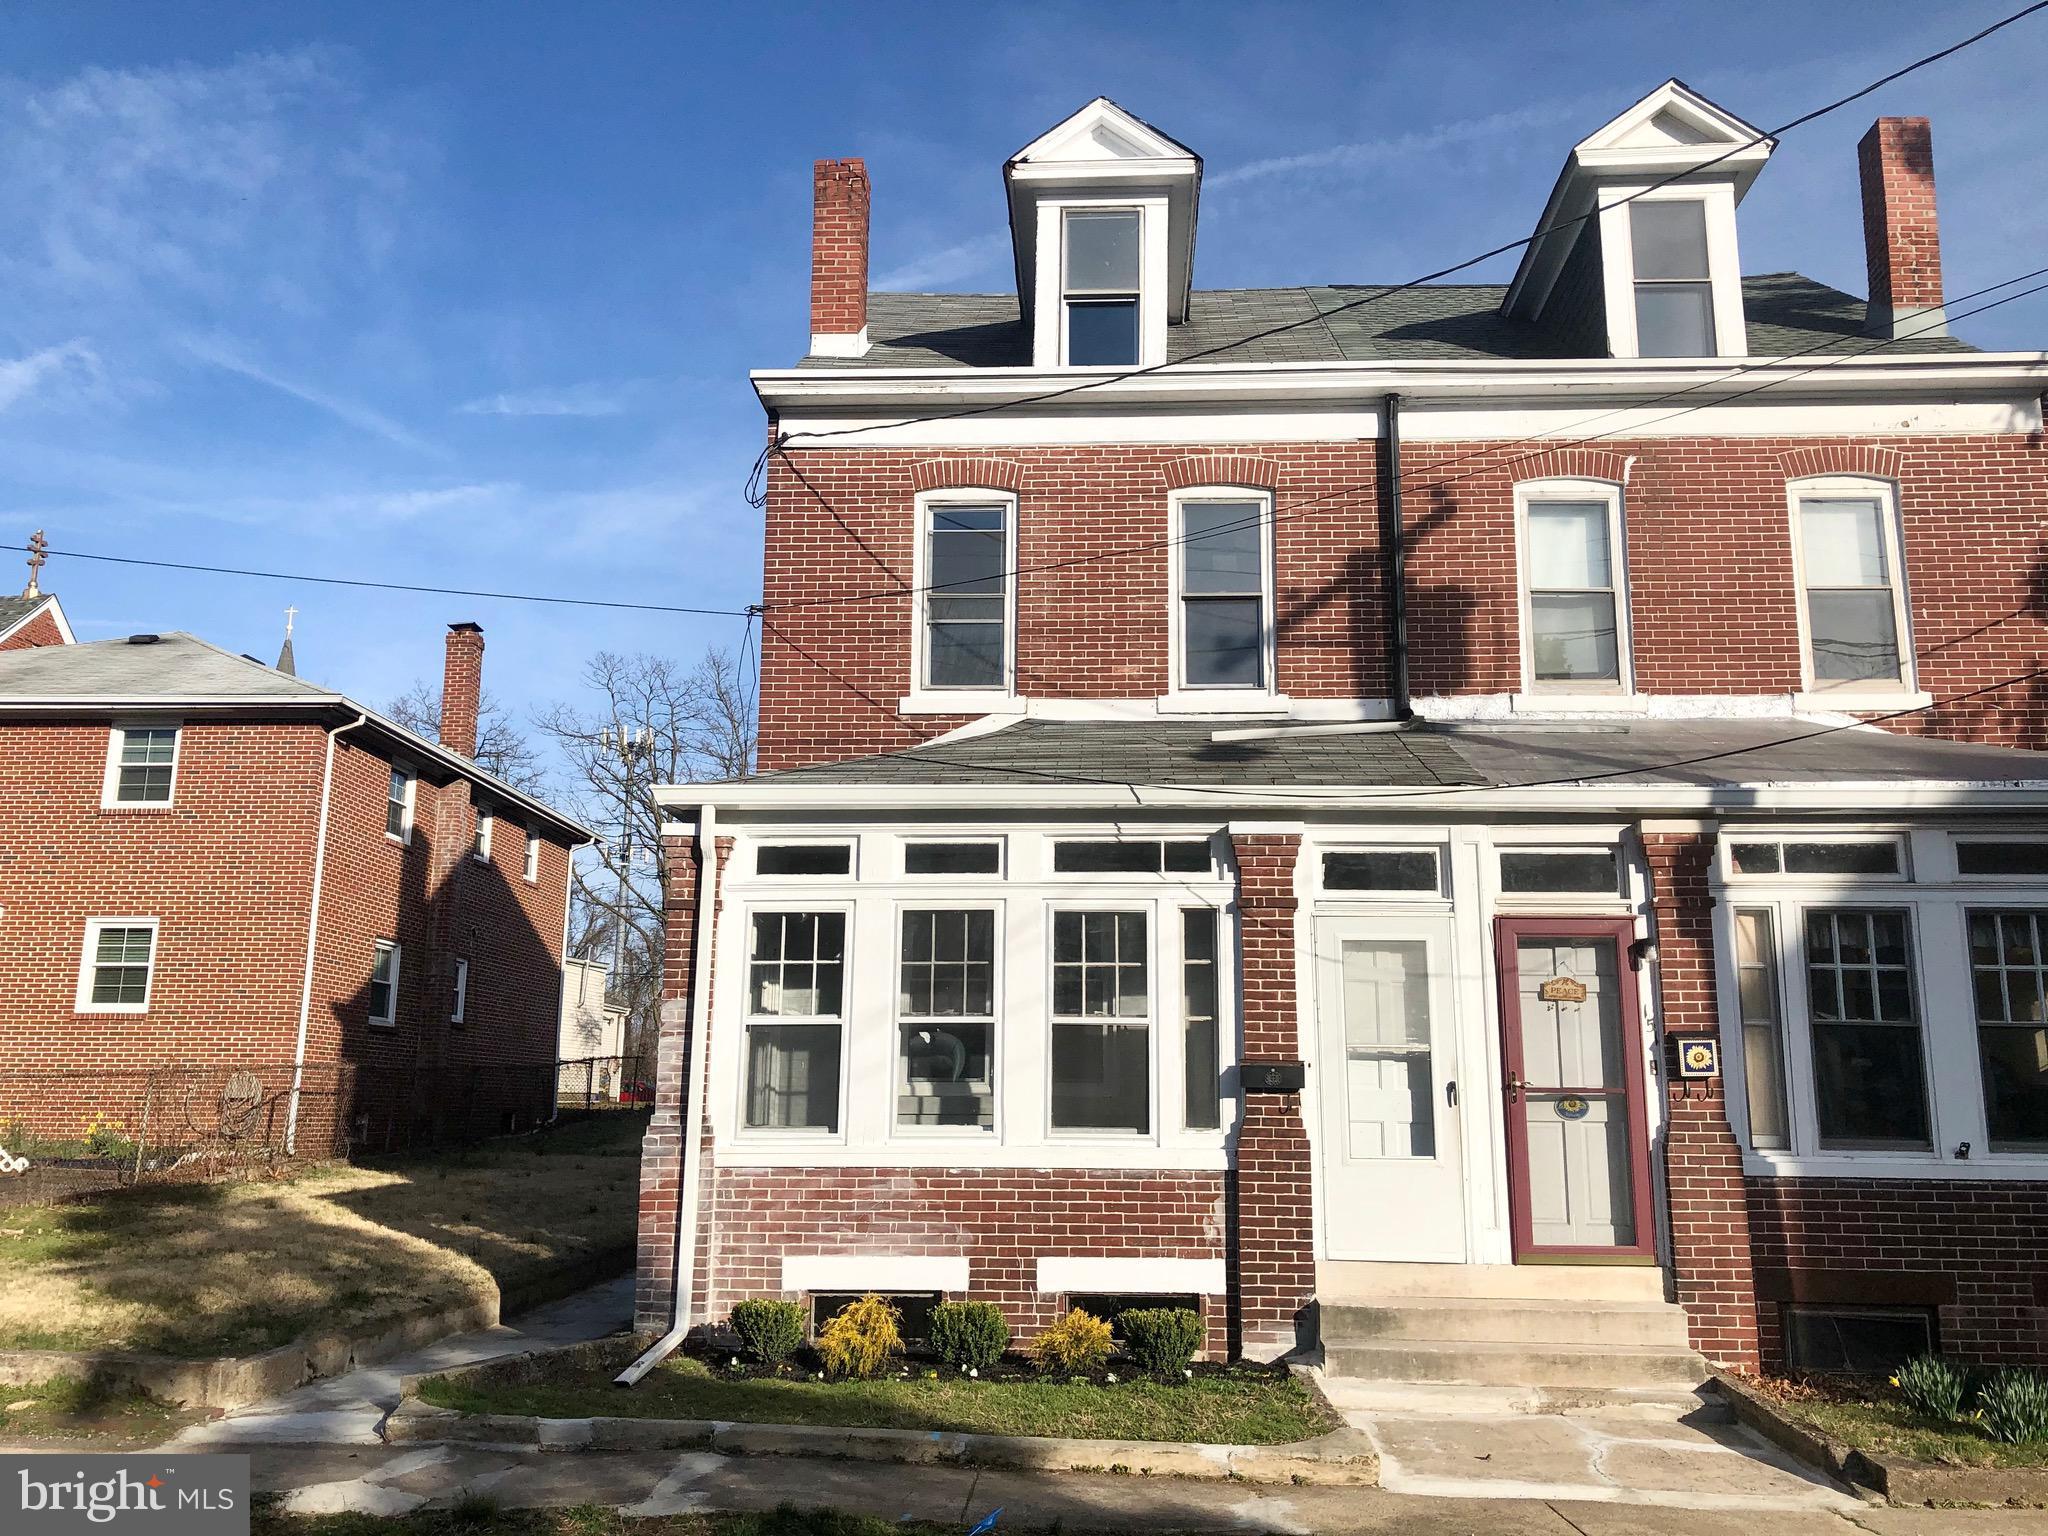 171 Norman Avenue, Roebling, NJ 08554